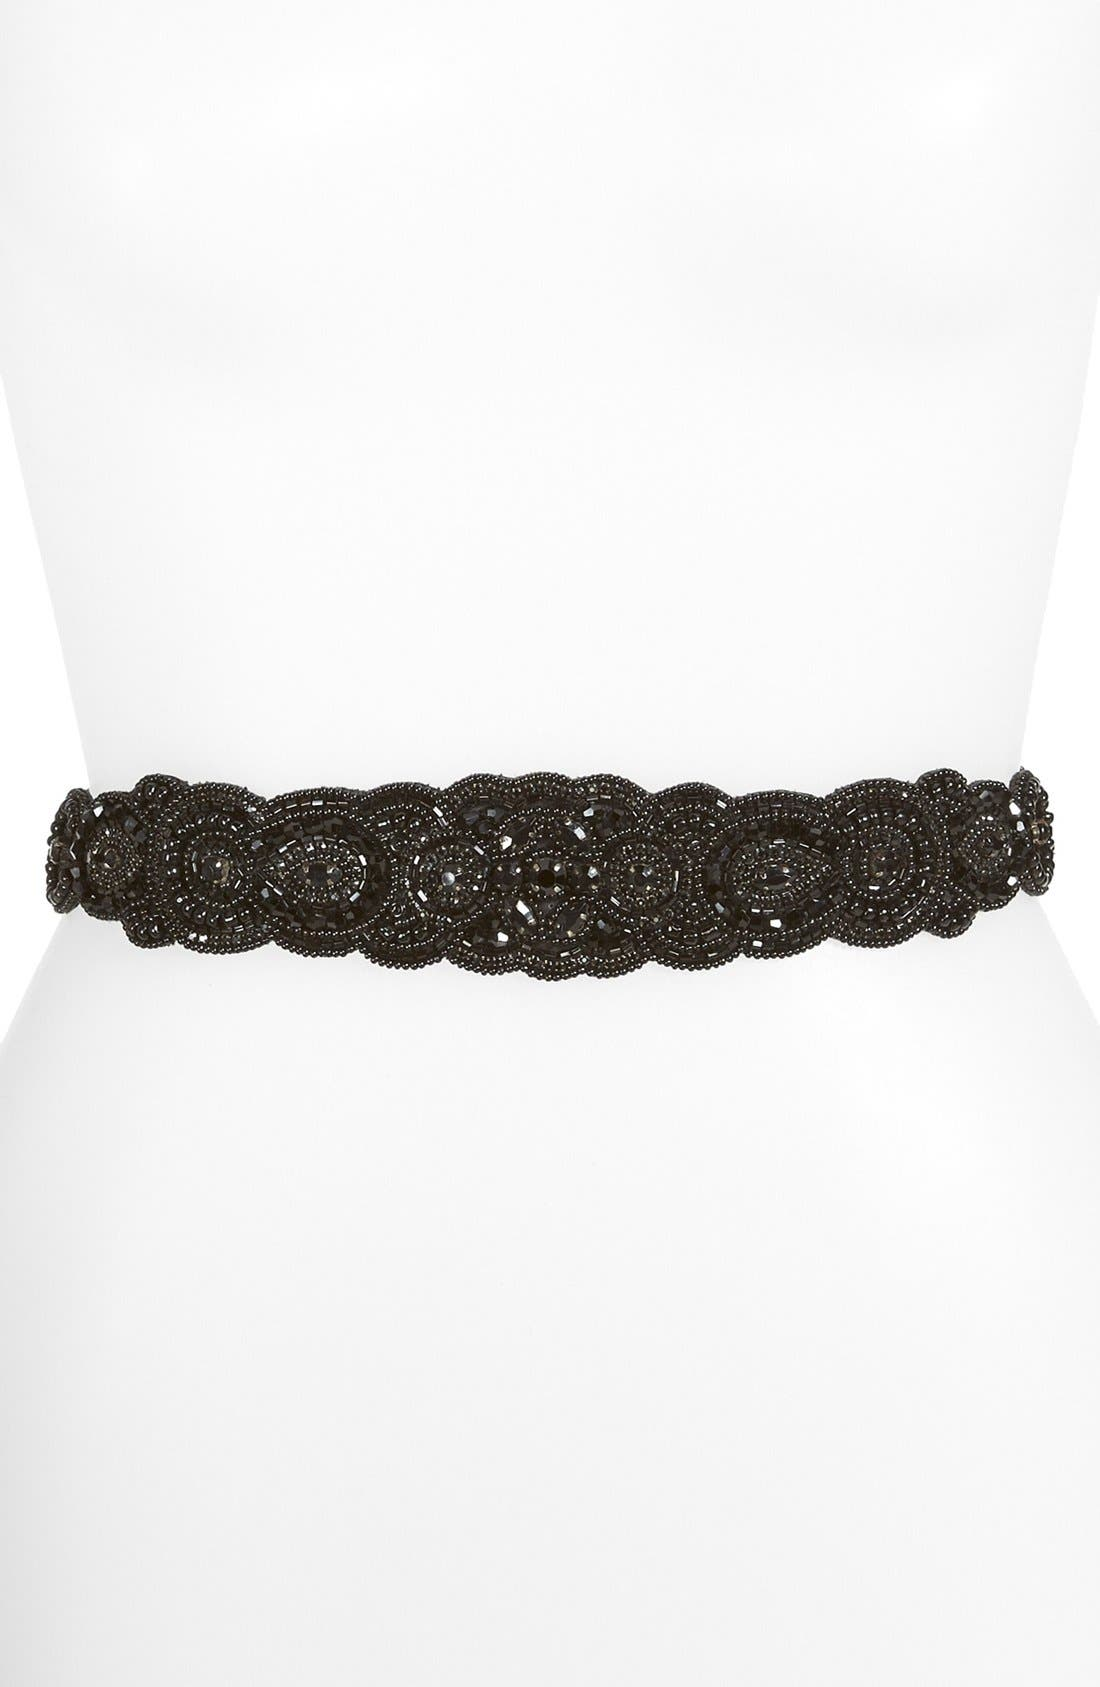 Main Image - Glint 'Arabesque' Beaded Stretch Belt